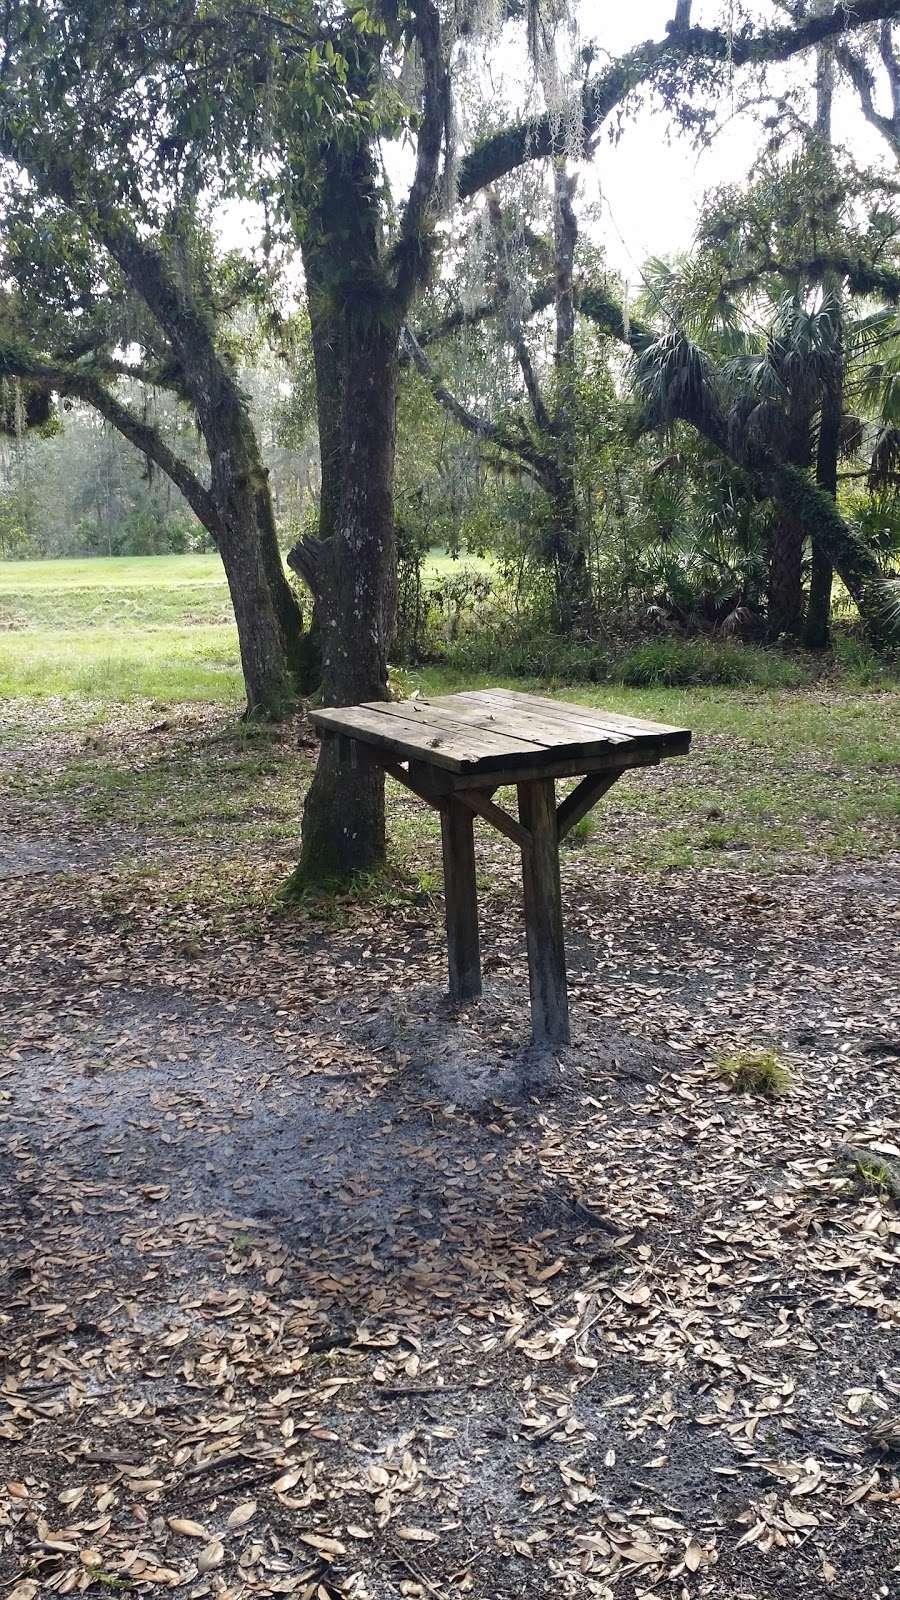 White Loop Group Campsite - campground  | Photo 3 of 5 | Address: Orlando, FL 32833, USA | Phone: (386) 329-4404